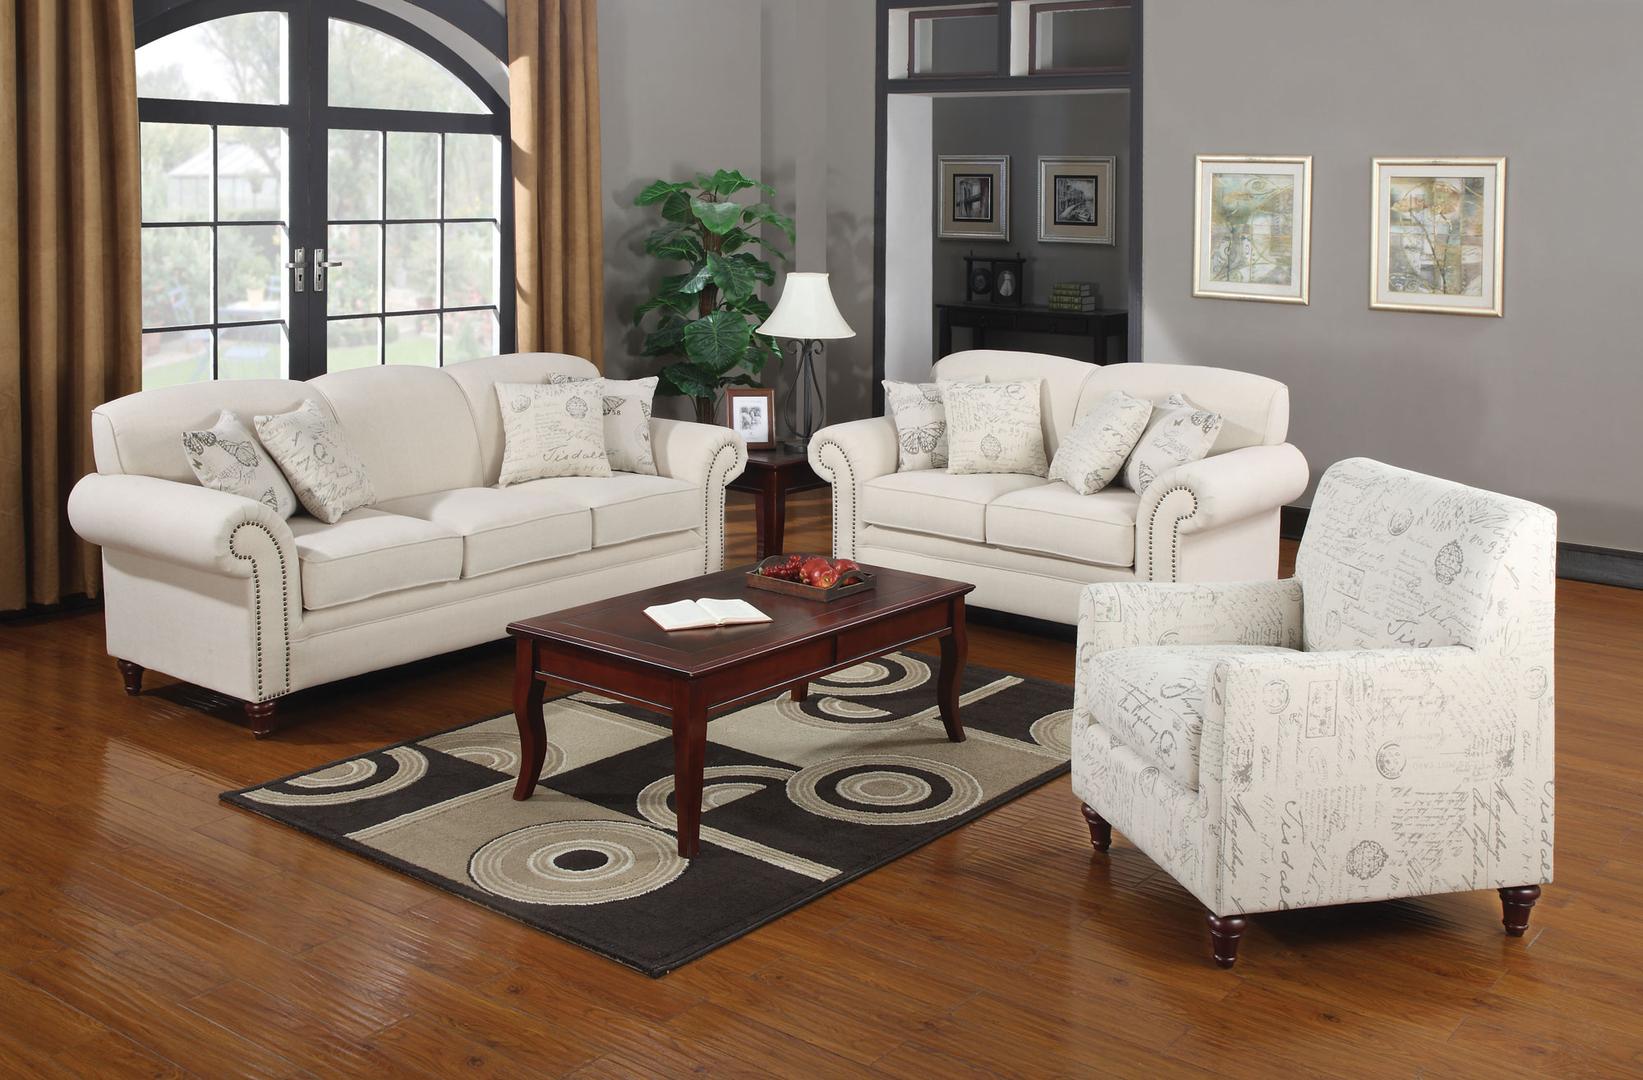 Elite furniture for less